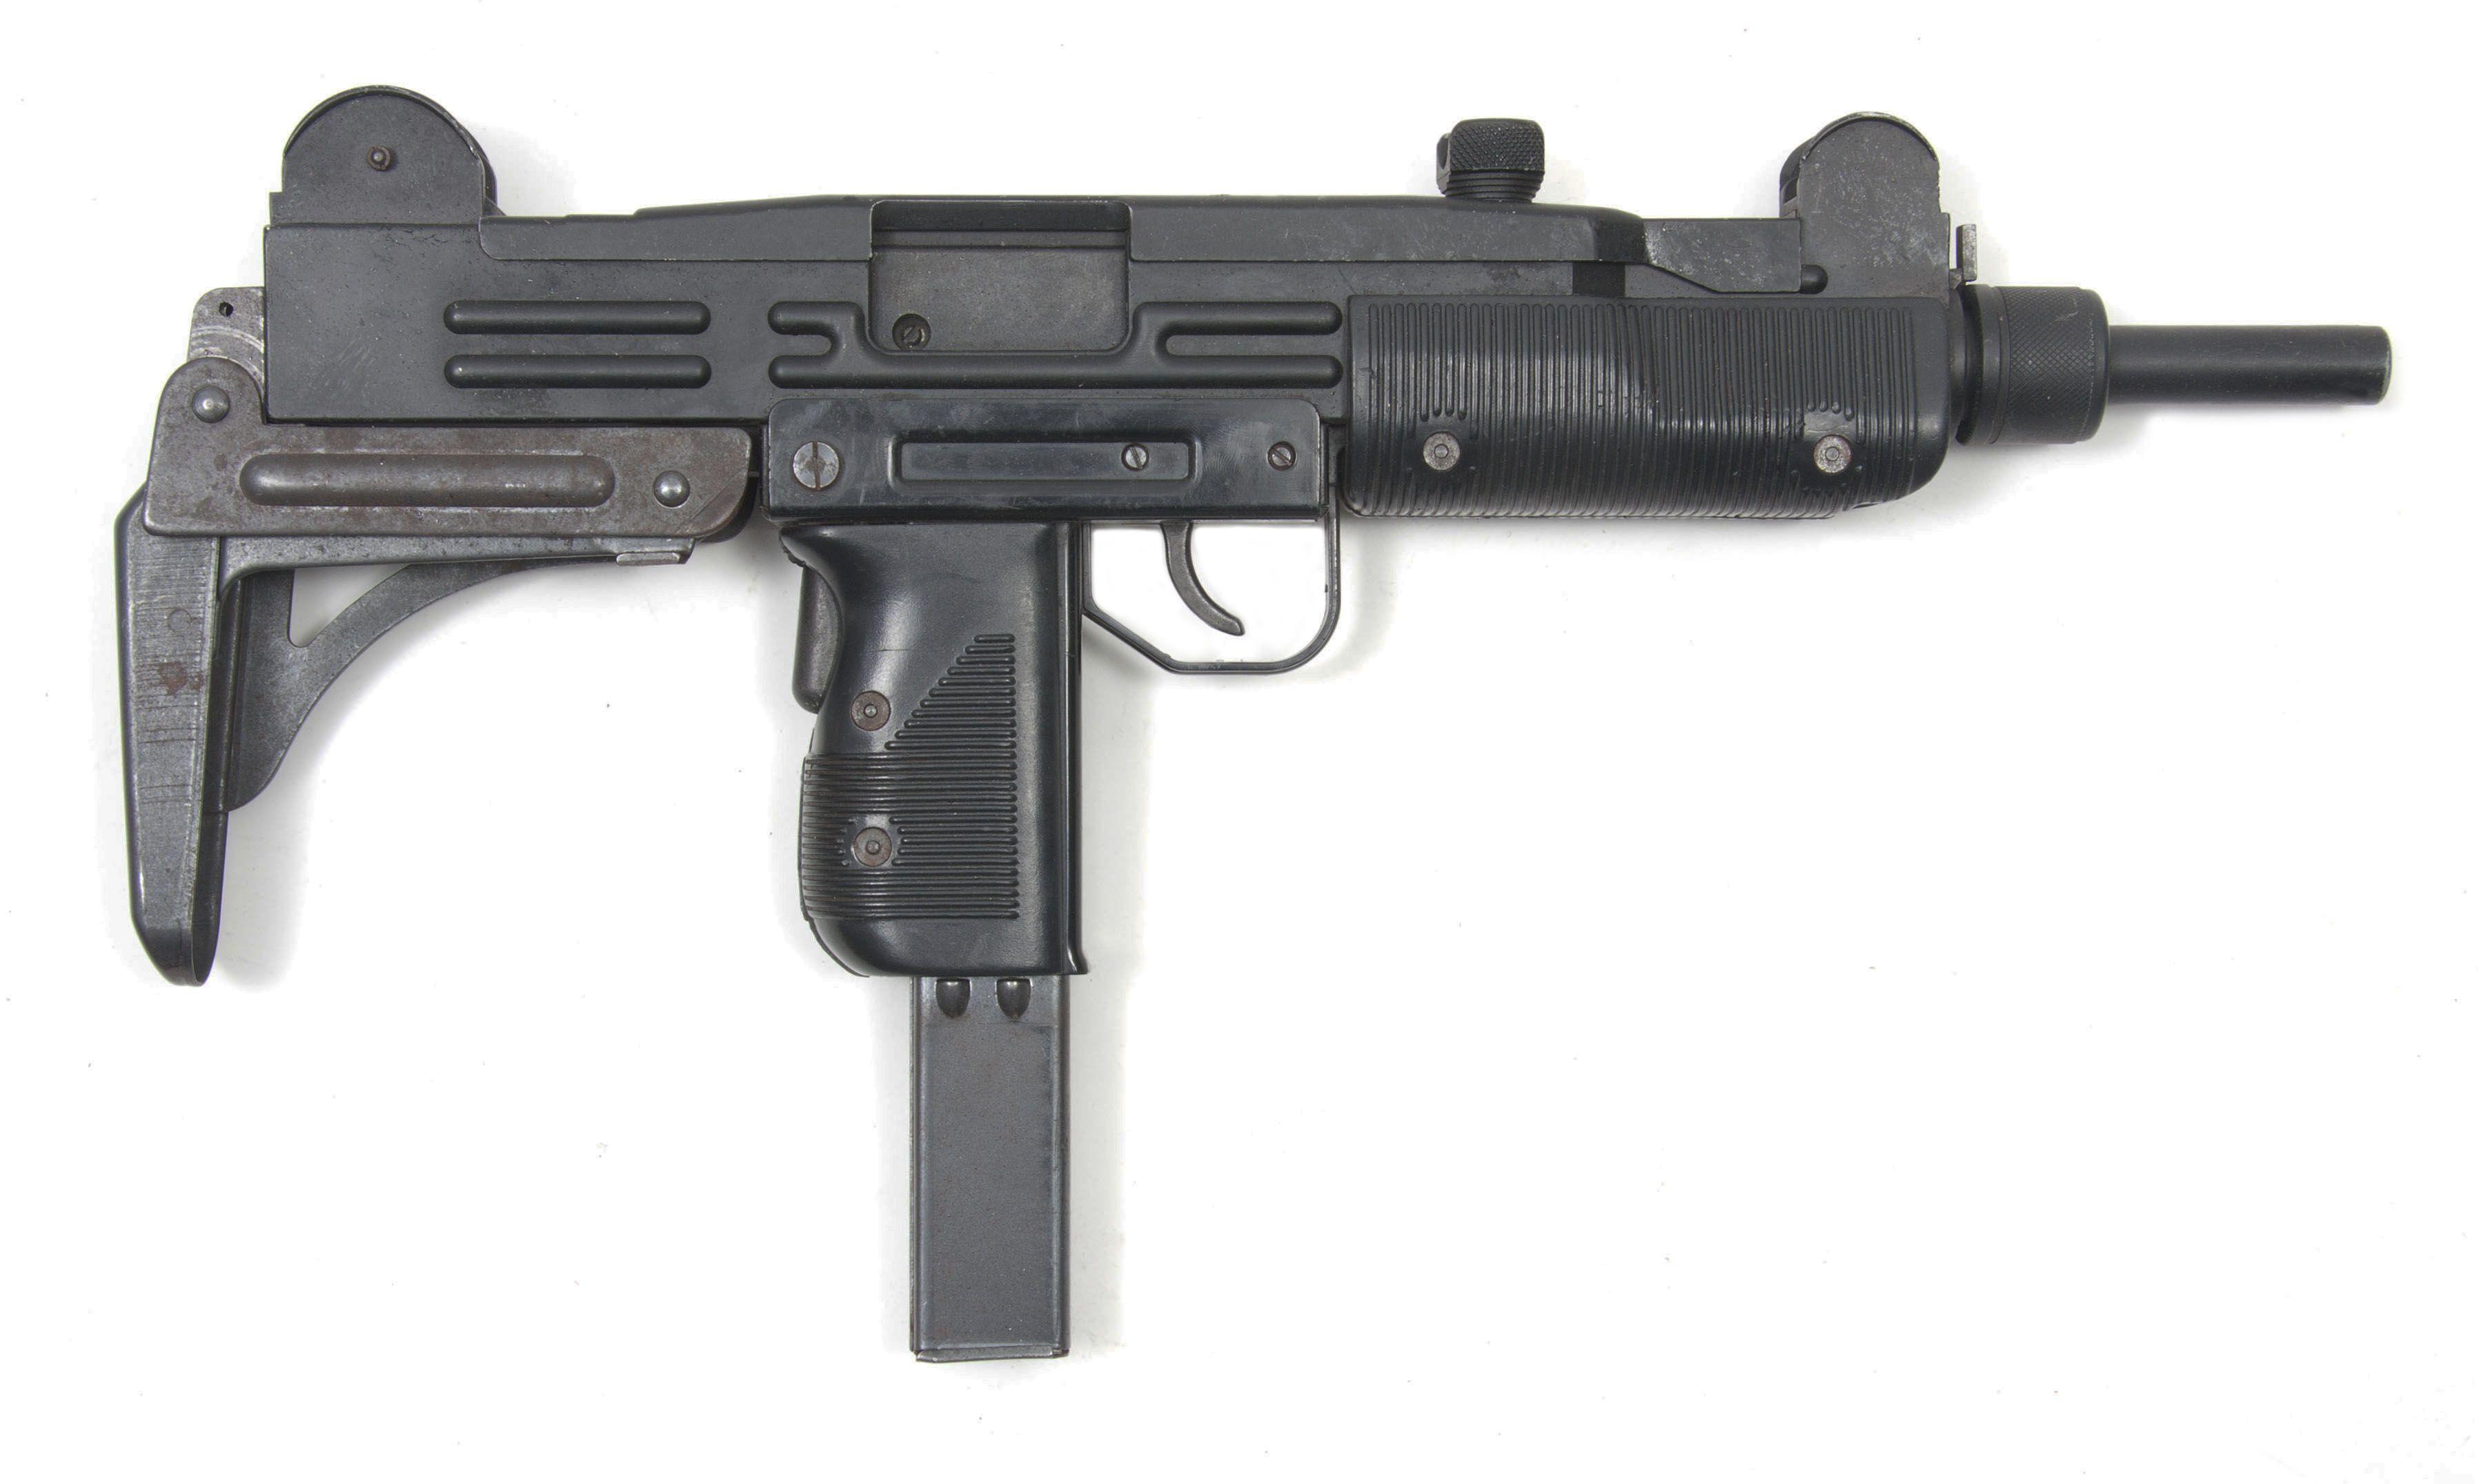 For sale trade imi uzi carbine made in israel 9mm - Assault Rifle Uzi Submachine Gun 9mm